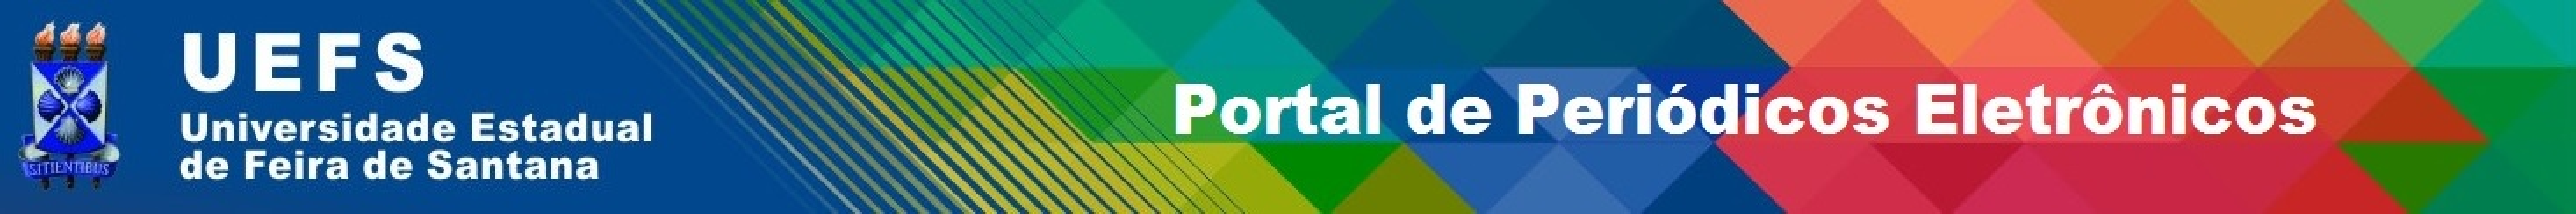 Portal de Periódicos Eletrônicos da Universidade Estadual de Feira de Santana